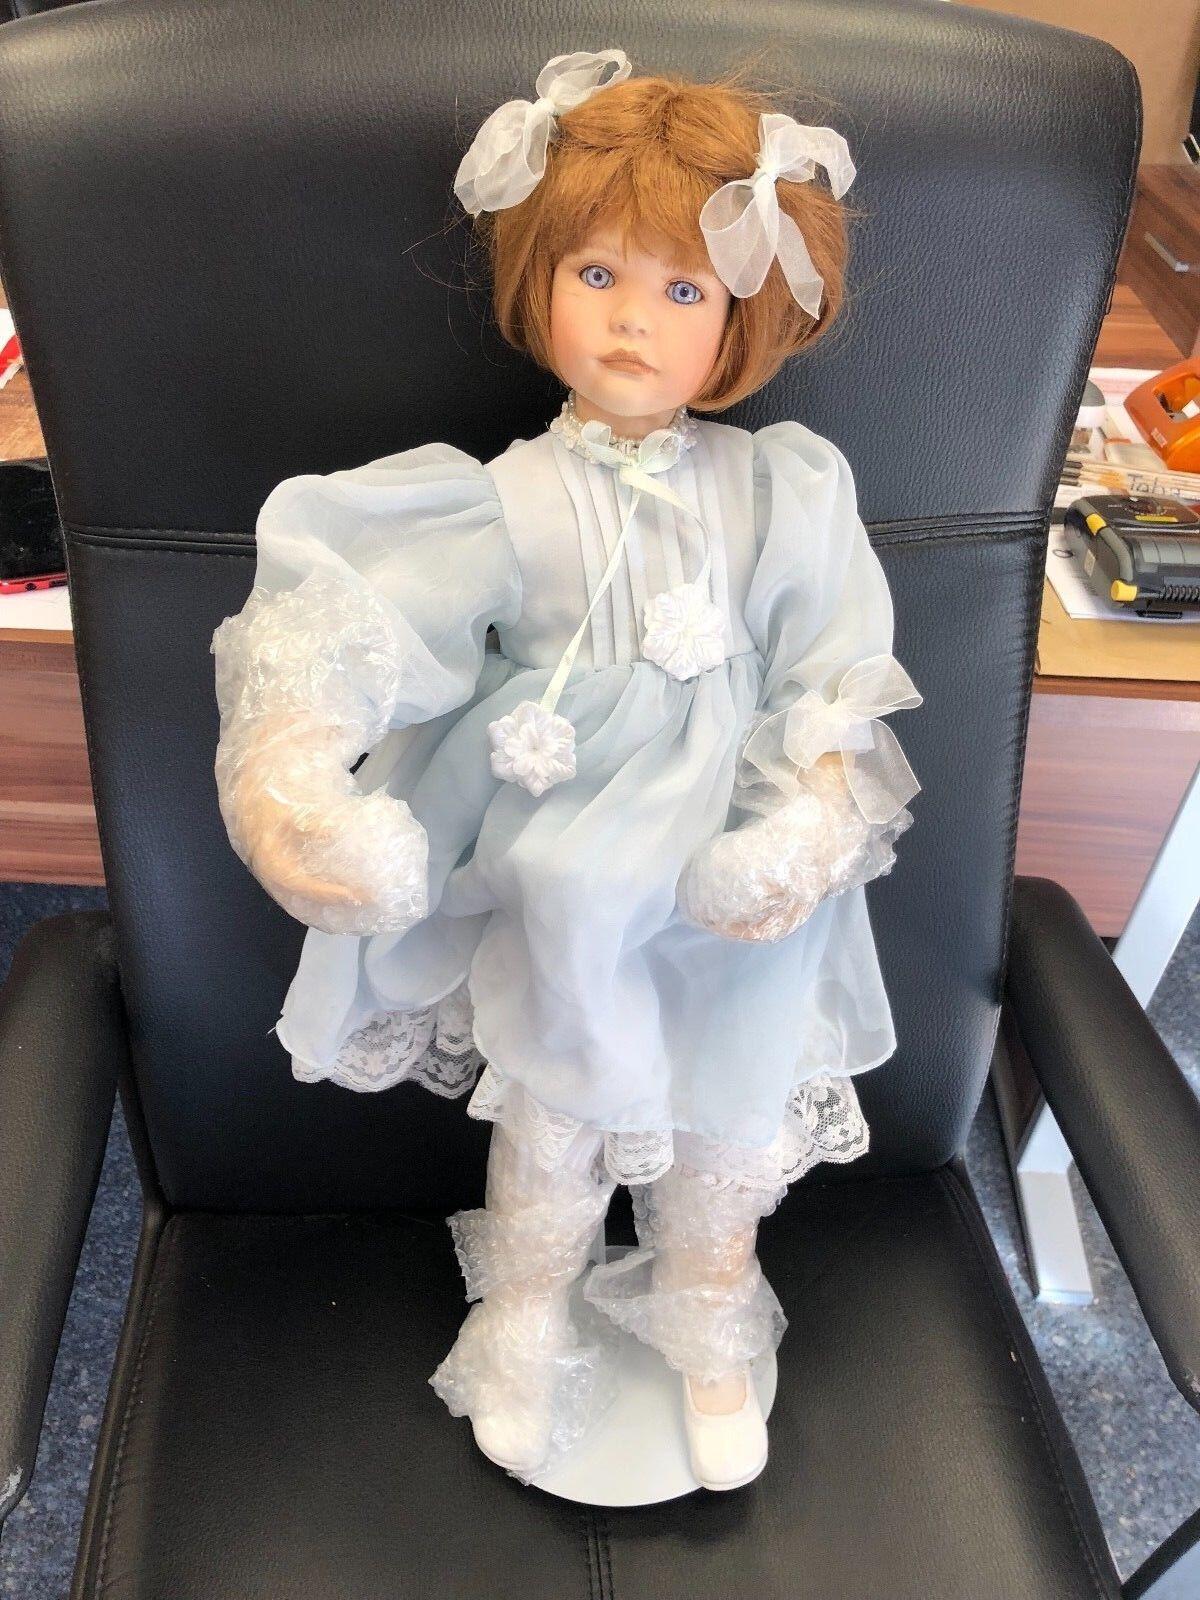 Ute Kase Lepp ⭐️⭐️ Porzellan Puppe 65 cm. ⭐️⭐️ Top Zustand